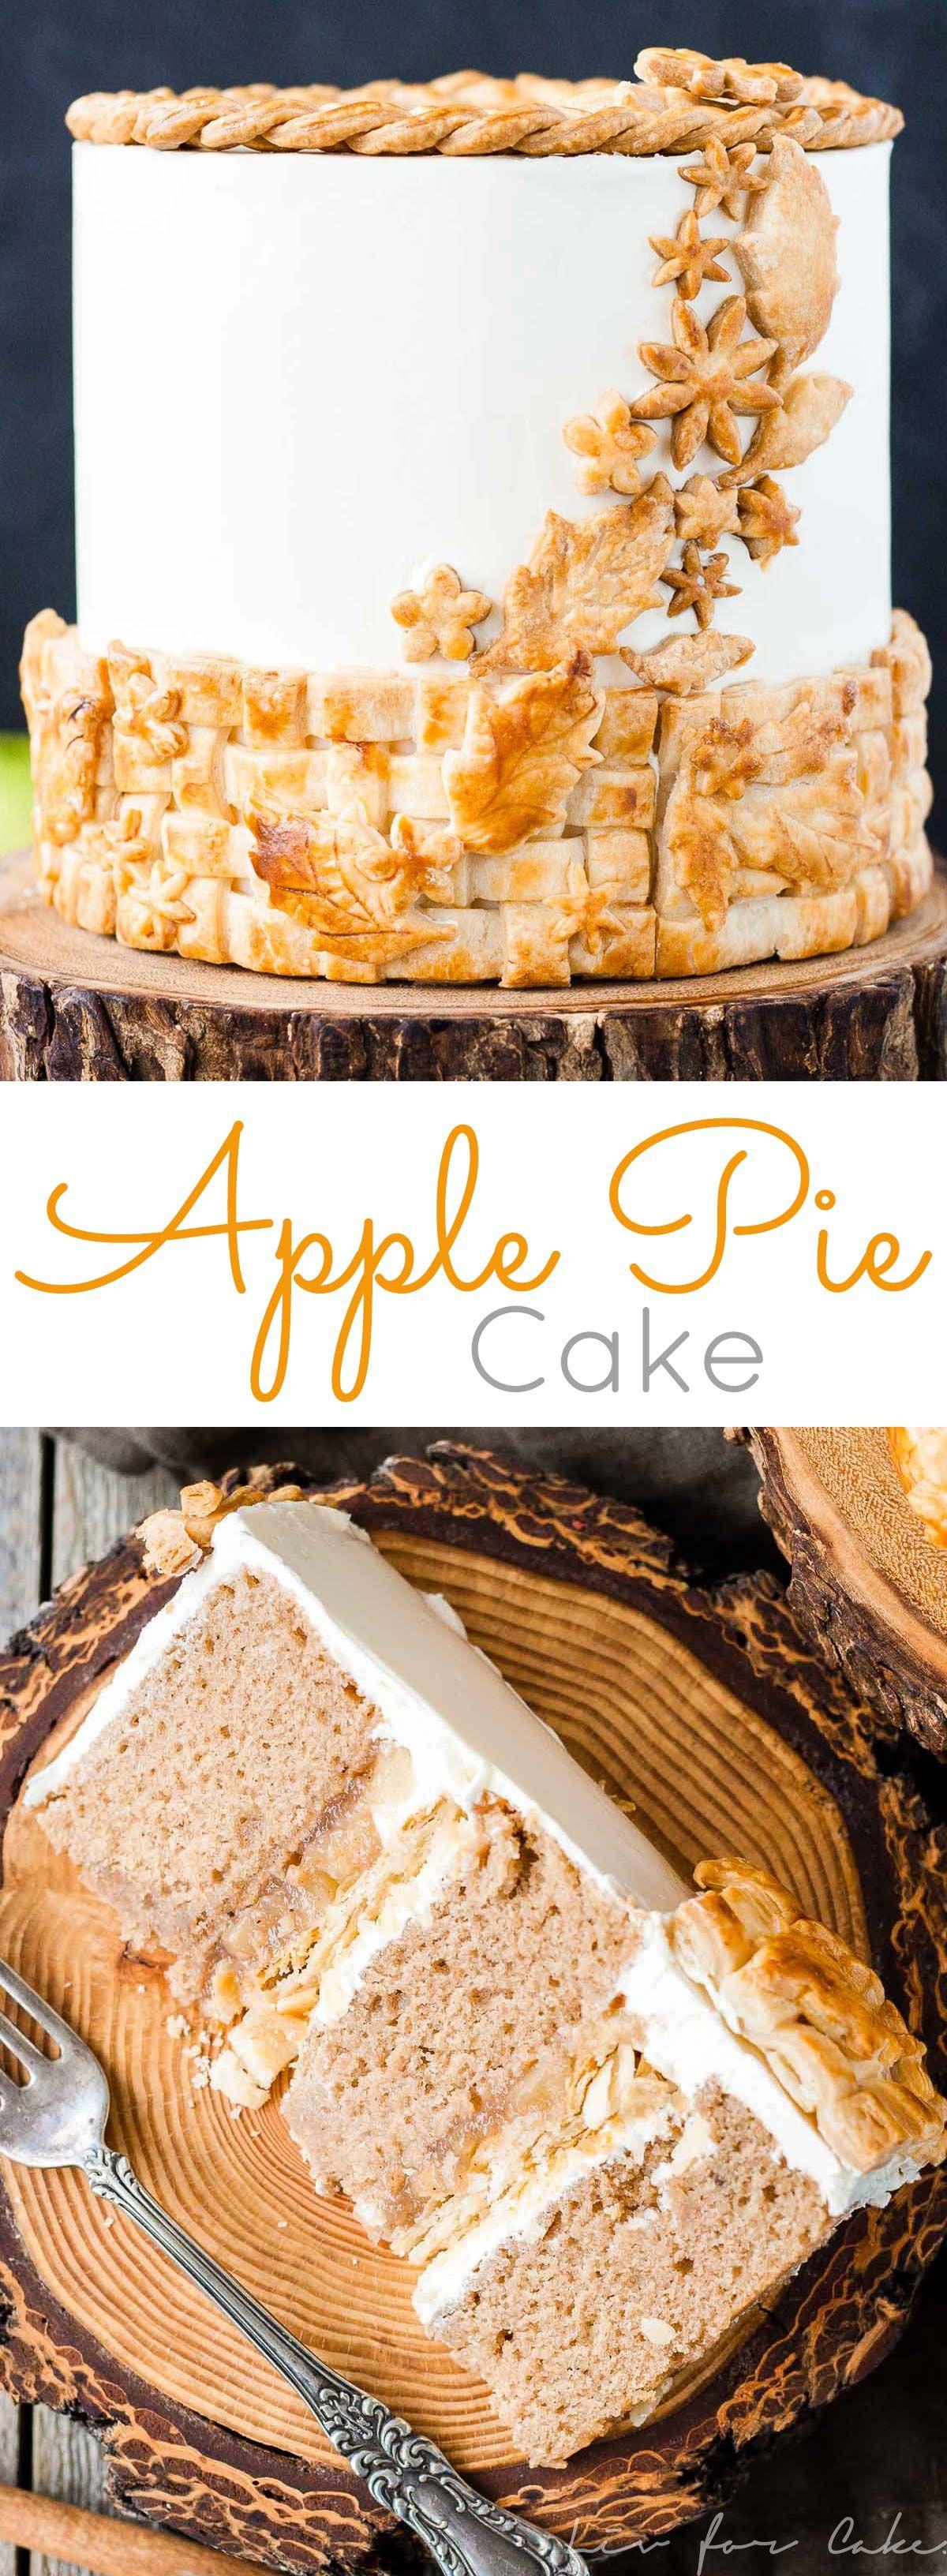 Apple Pie Cake! Layers of spice cake, vanilla buttercream